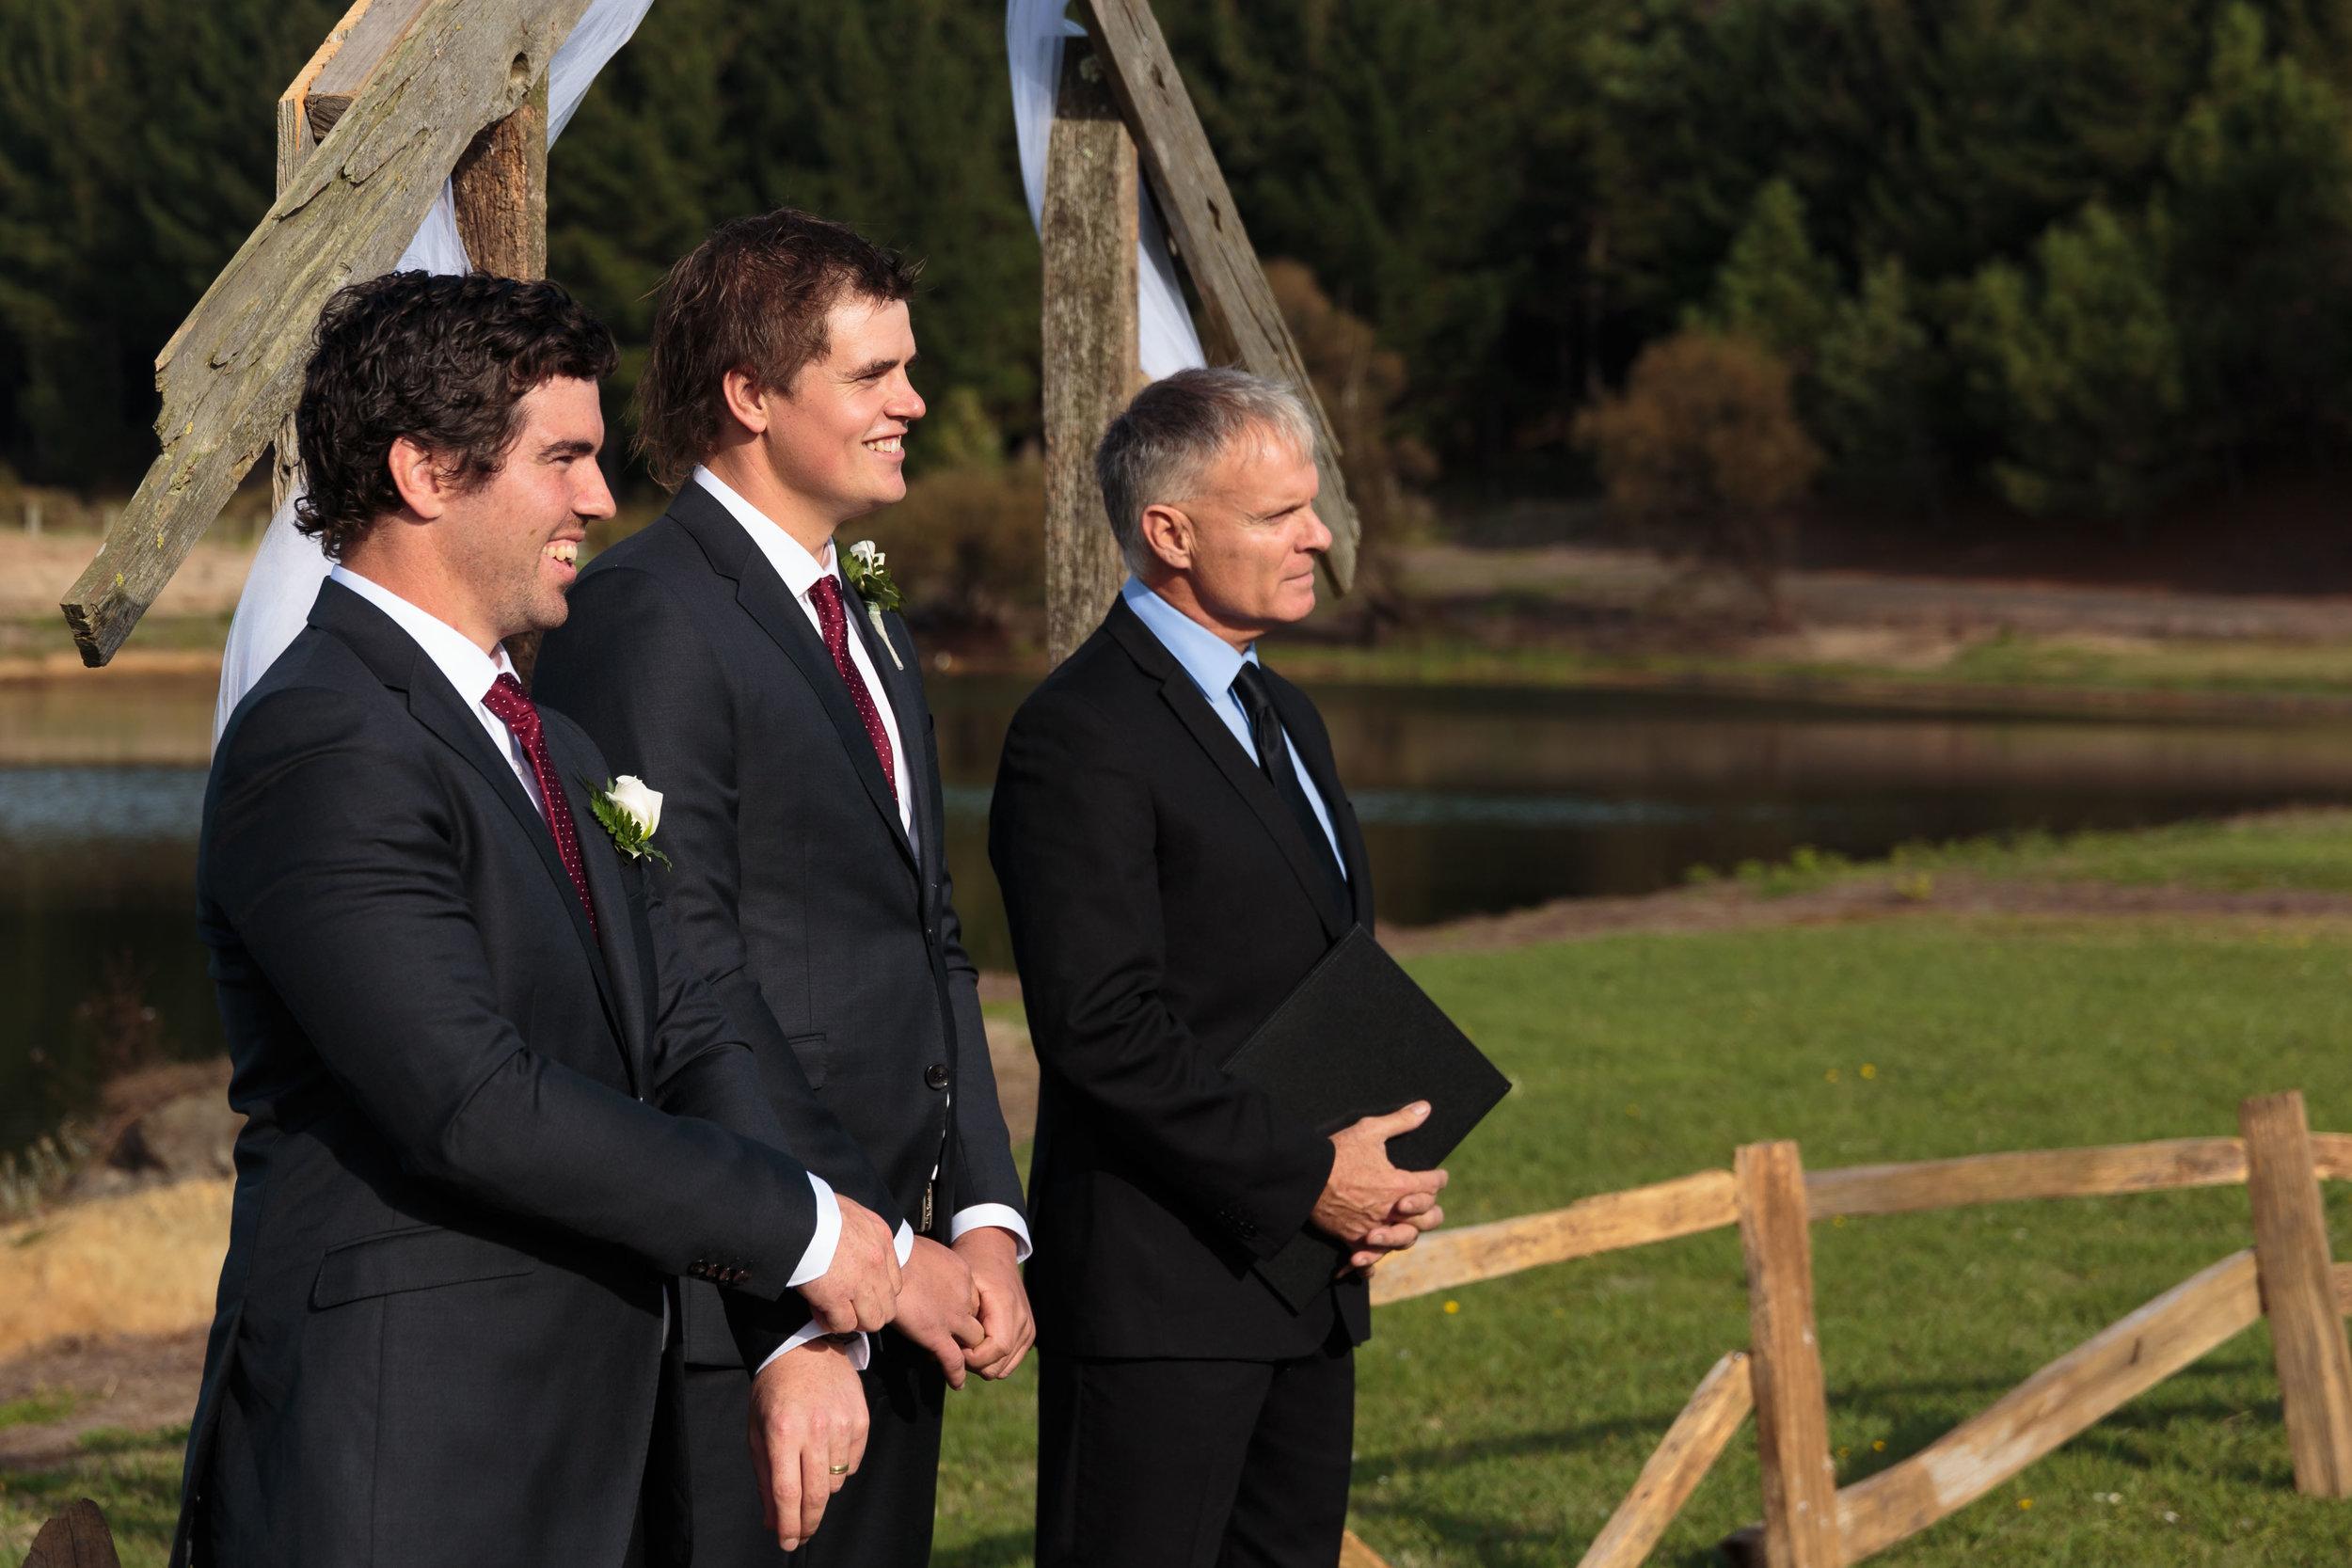 Highight-wedding-photography-dudding-lake-palmerston-north-new-zealand-26.jpg